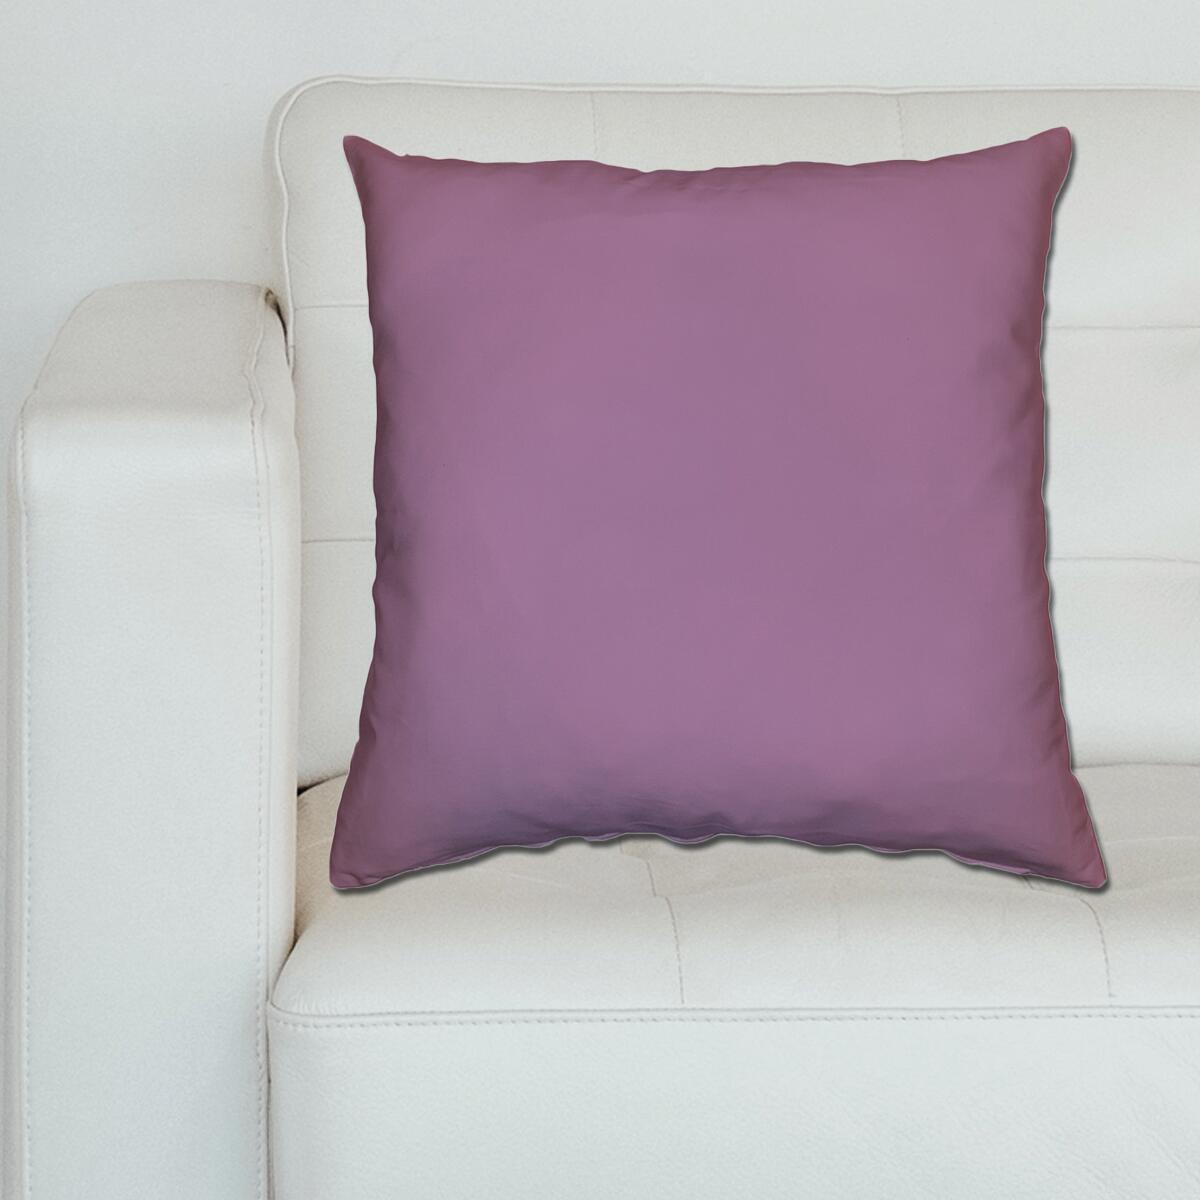 Cuscino Loneta lilla 70x70 cm - 3